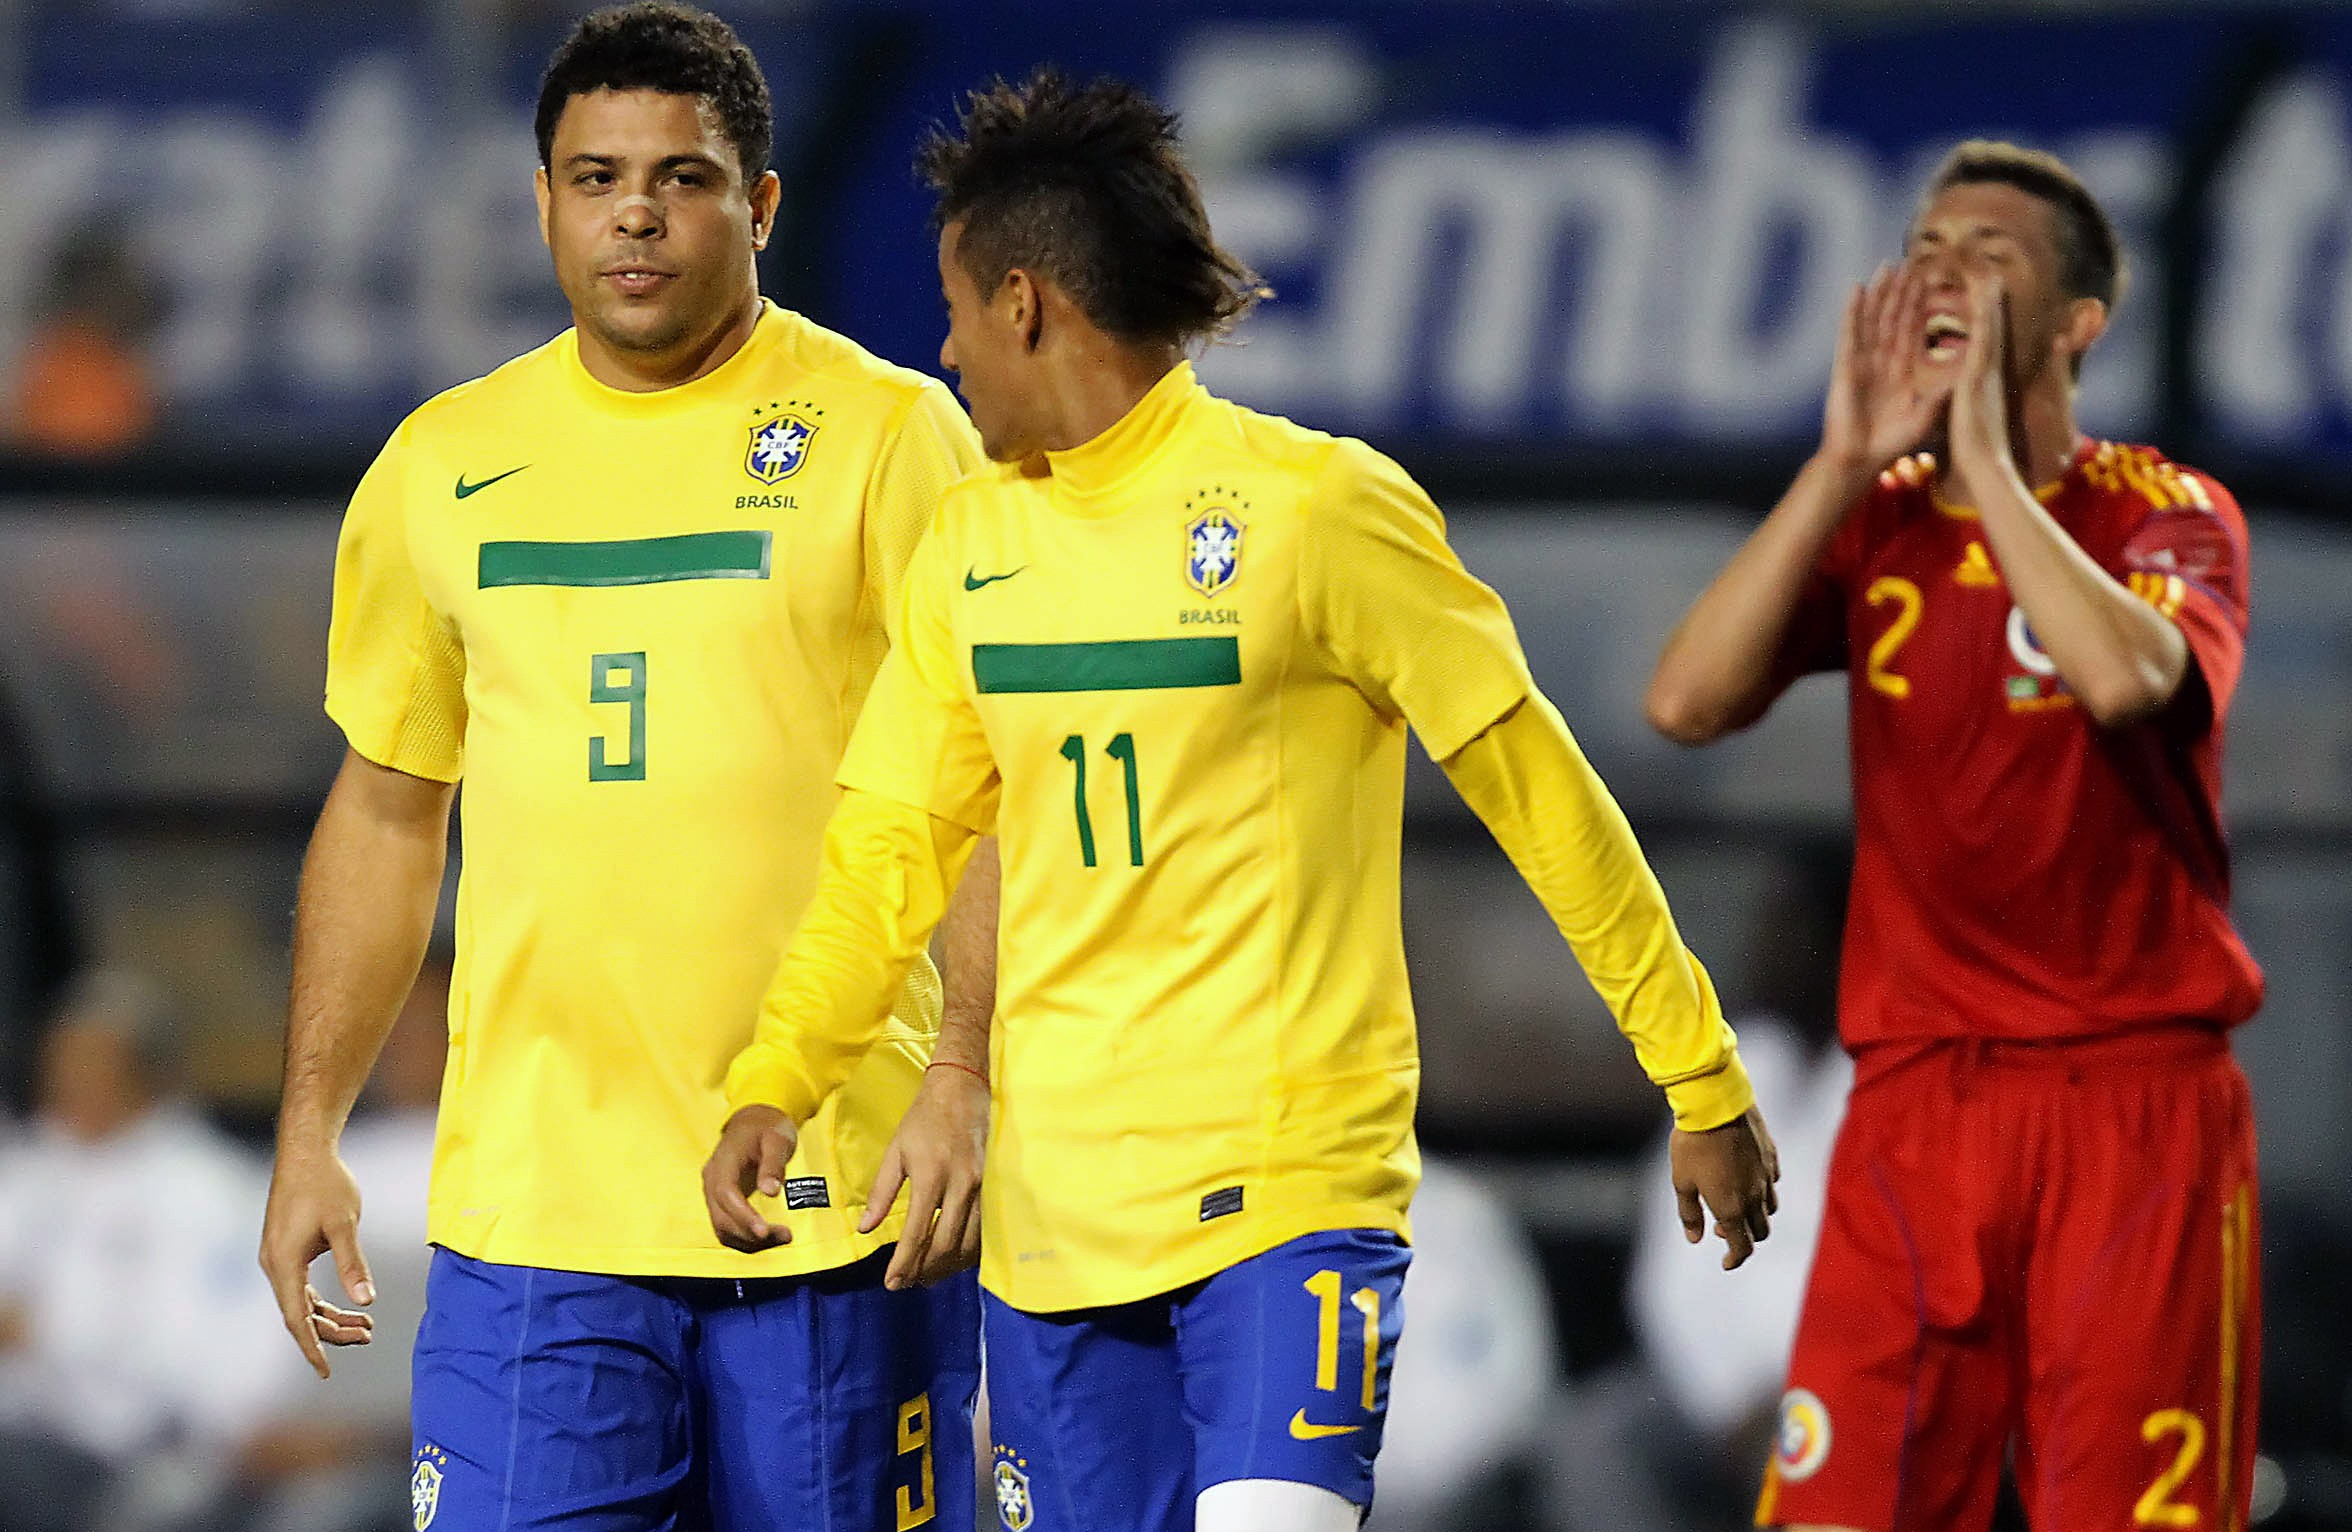 Brazils-Ronaldo-Nazario-L-walks-next-1570640640.jpg